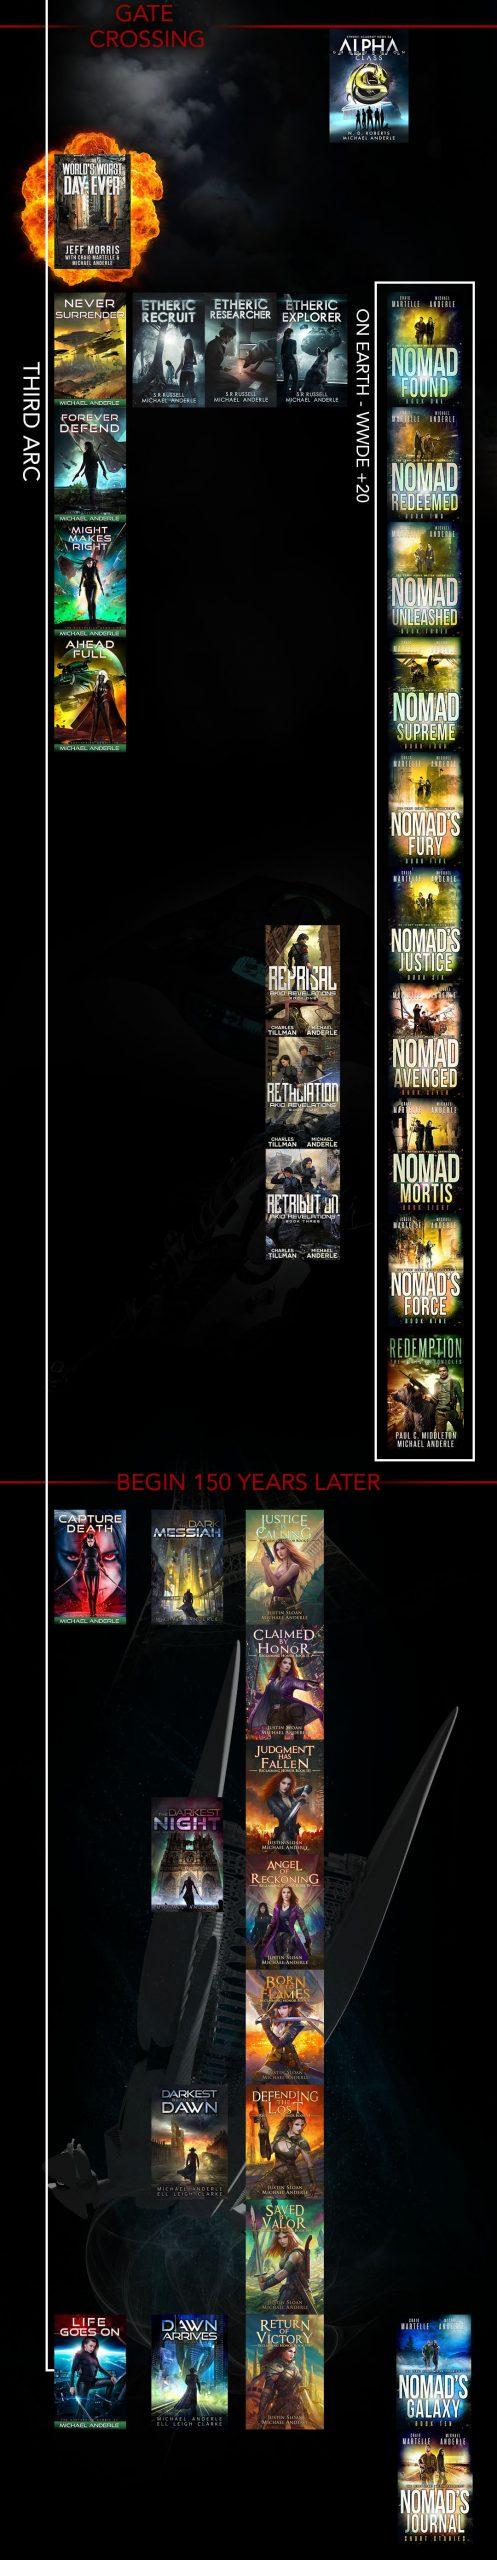 TKG New Timeline-2